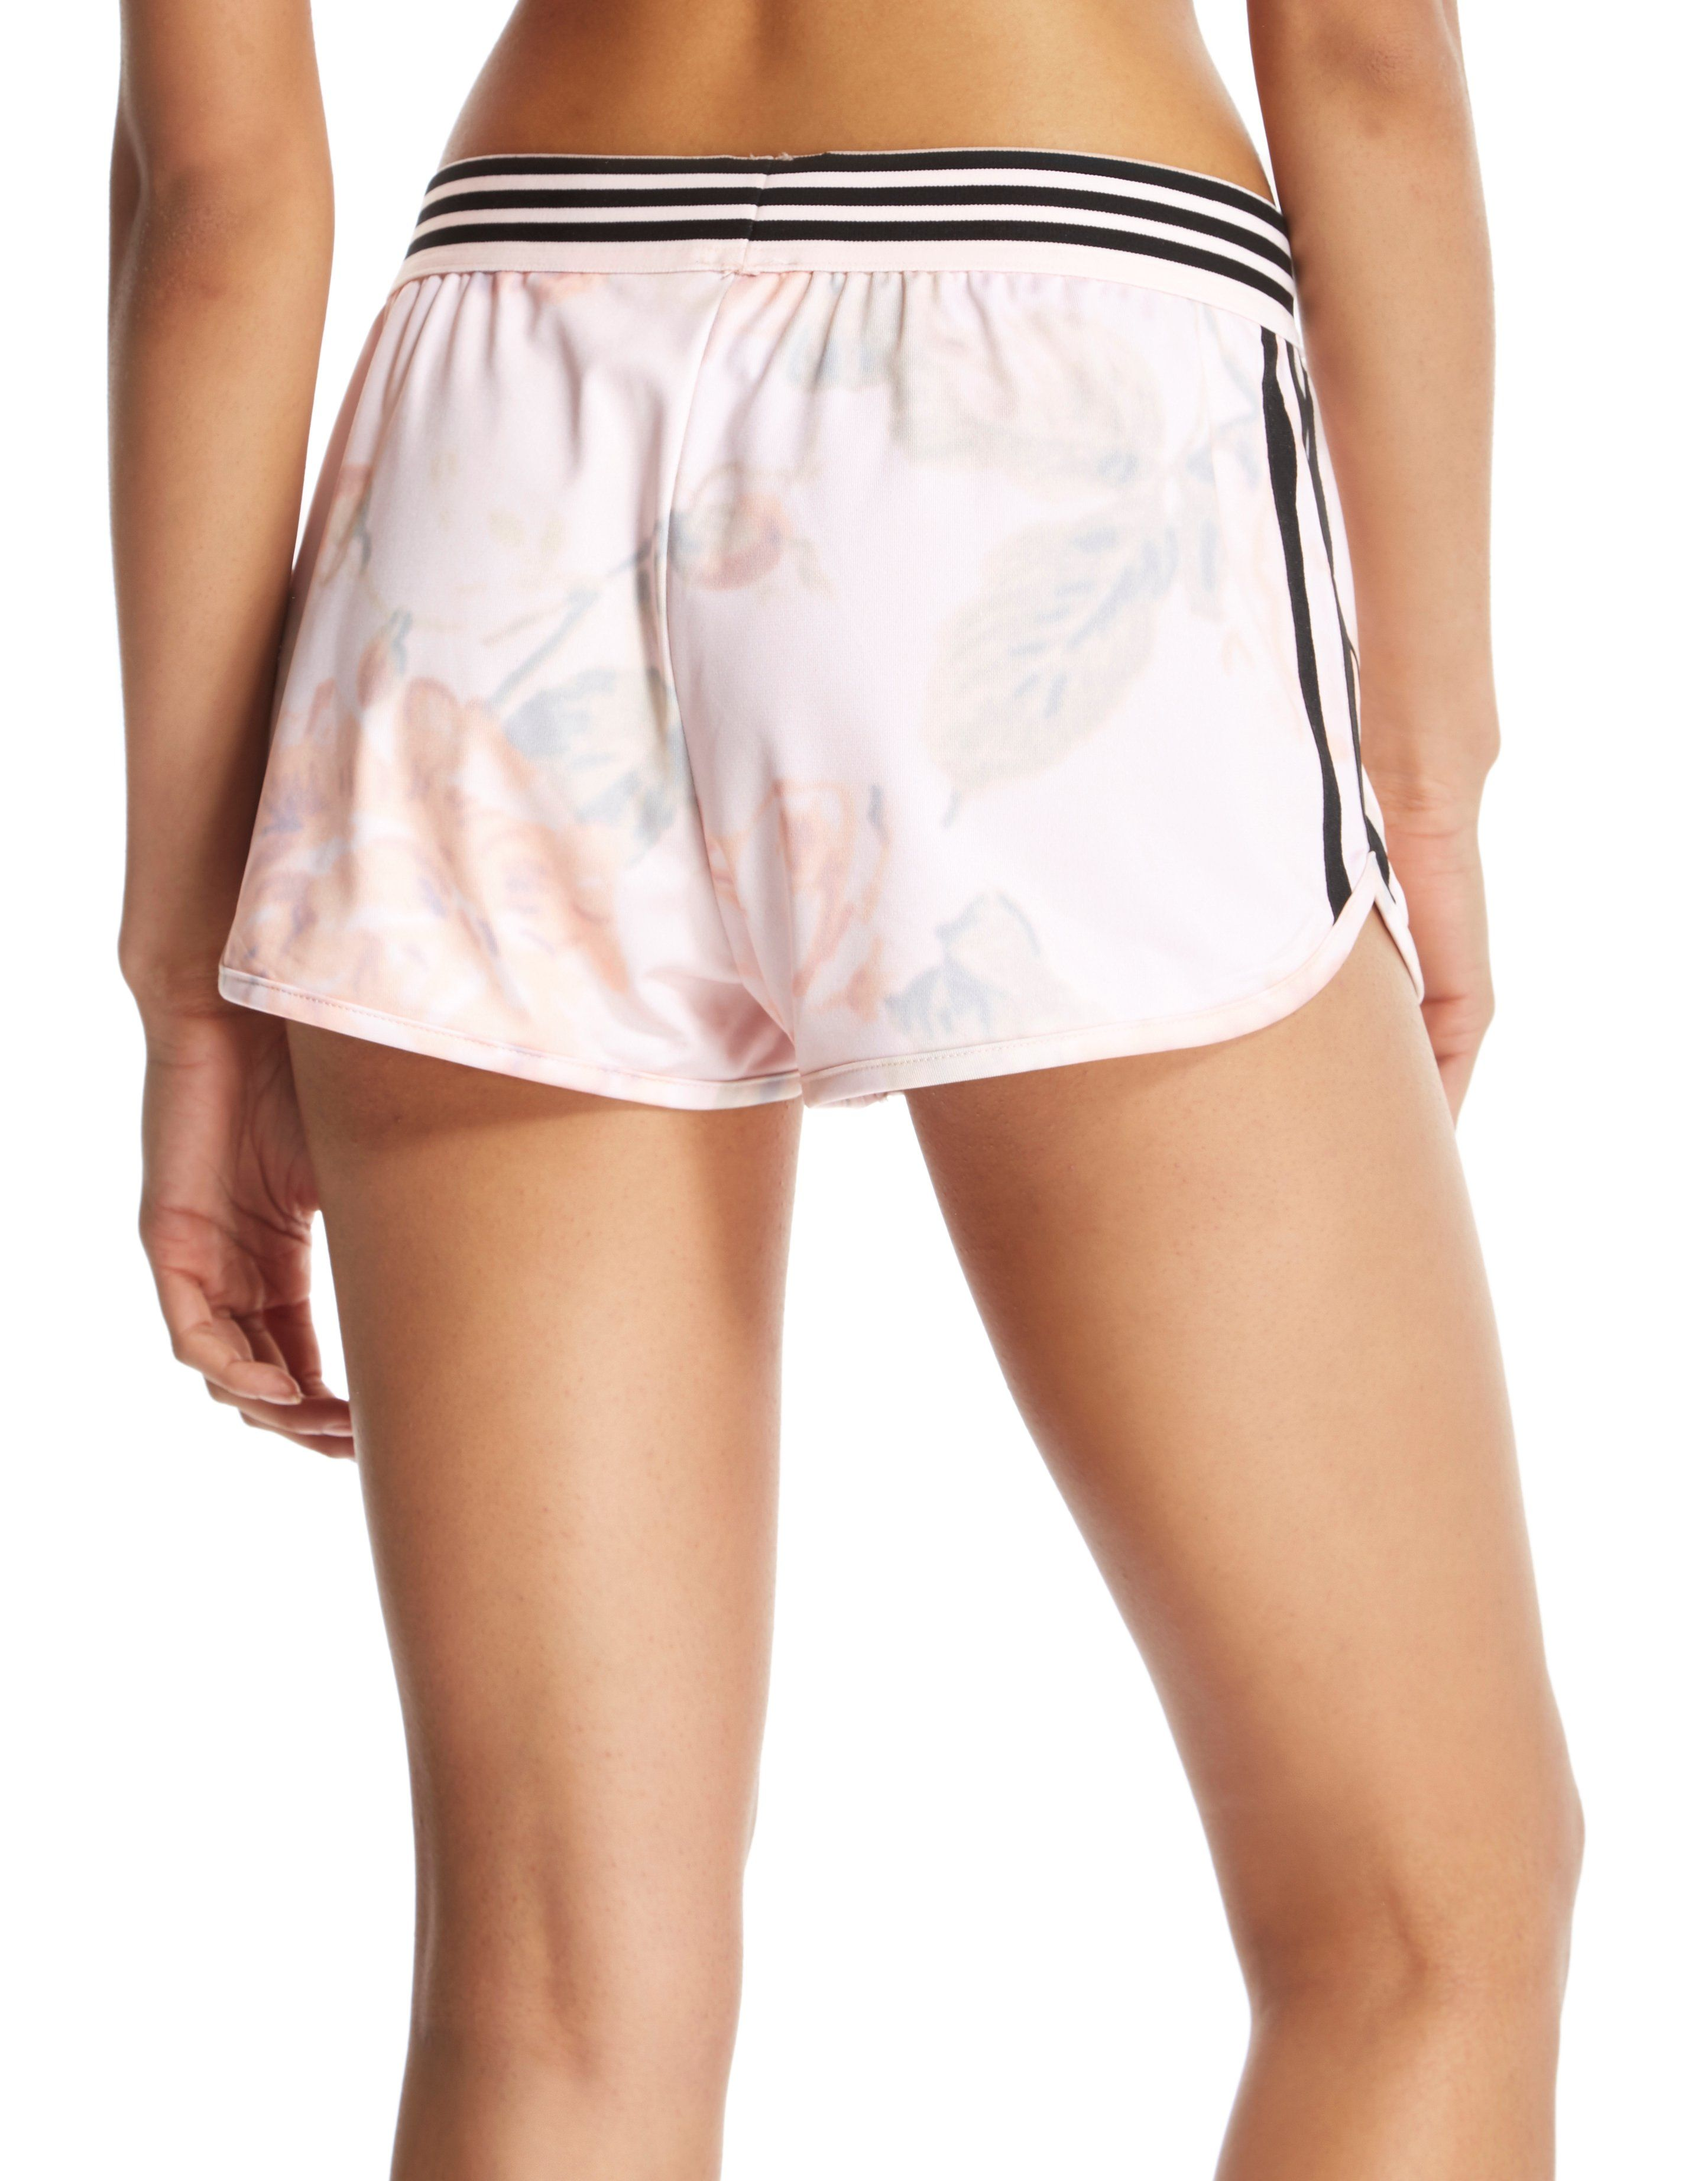 adidas Originals 'Rose Collection' Pastel Rose Running Shorts